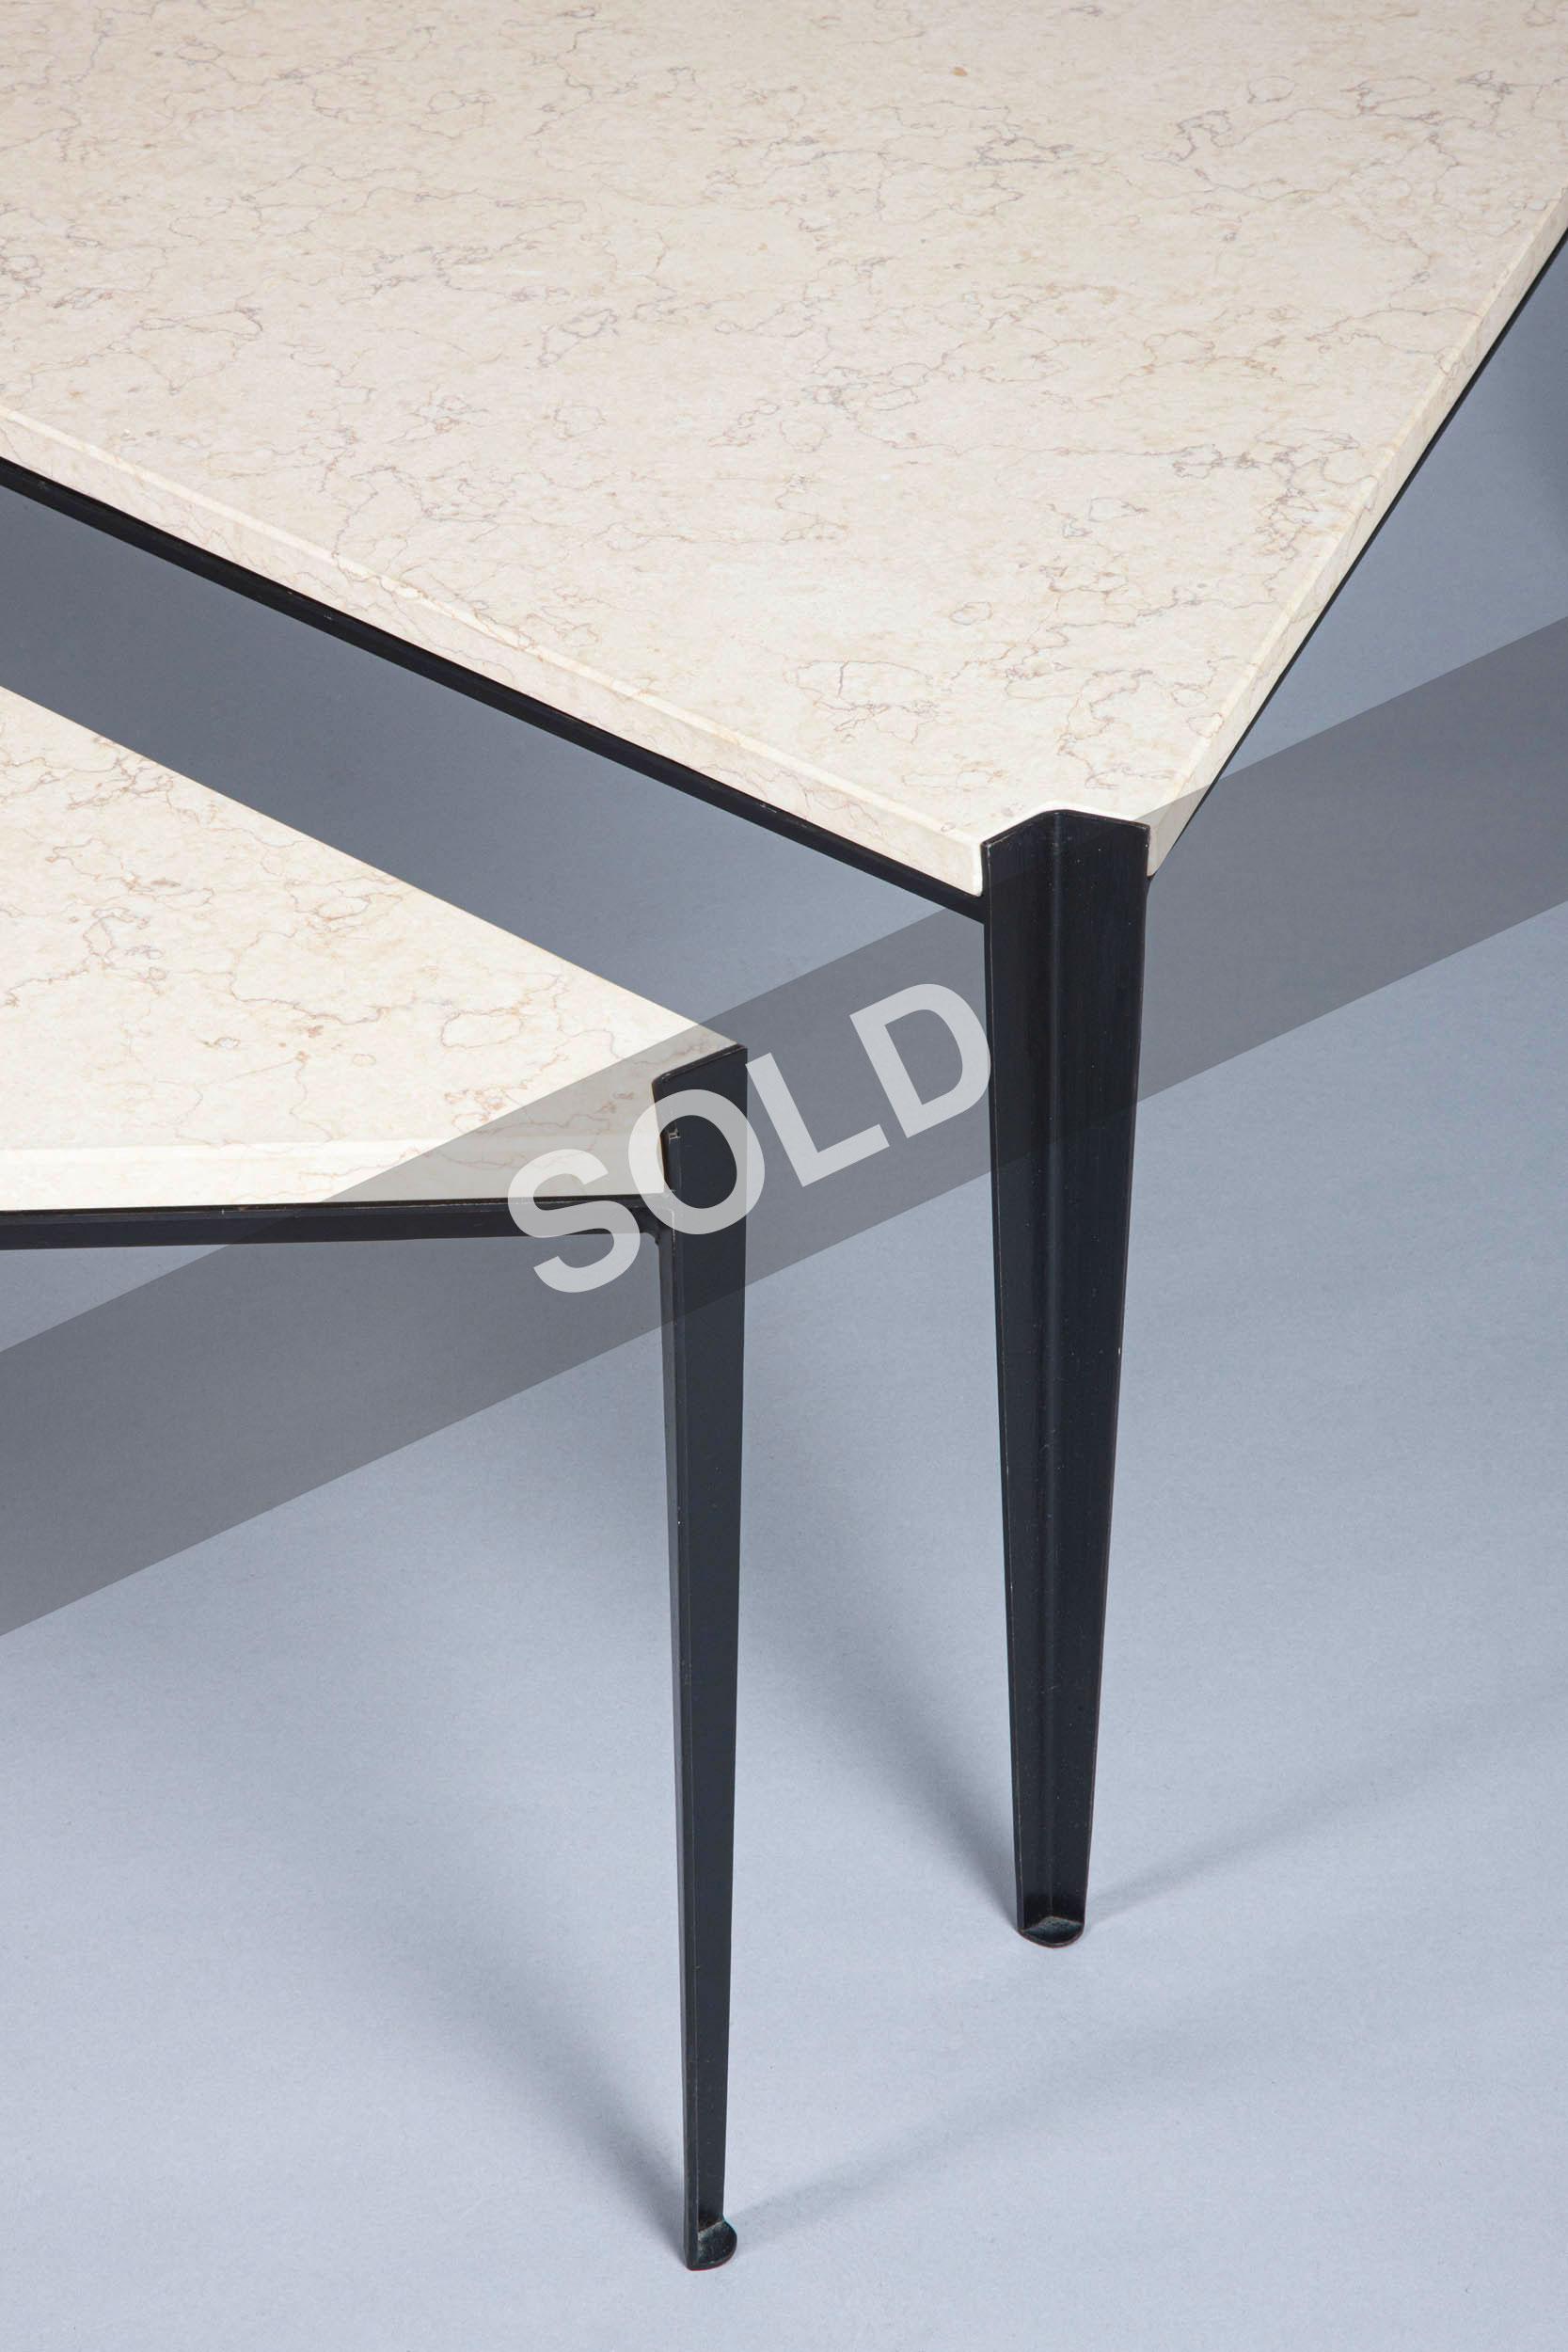 Osvaldo Borsani painted tables